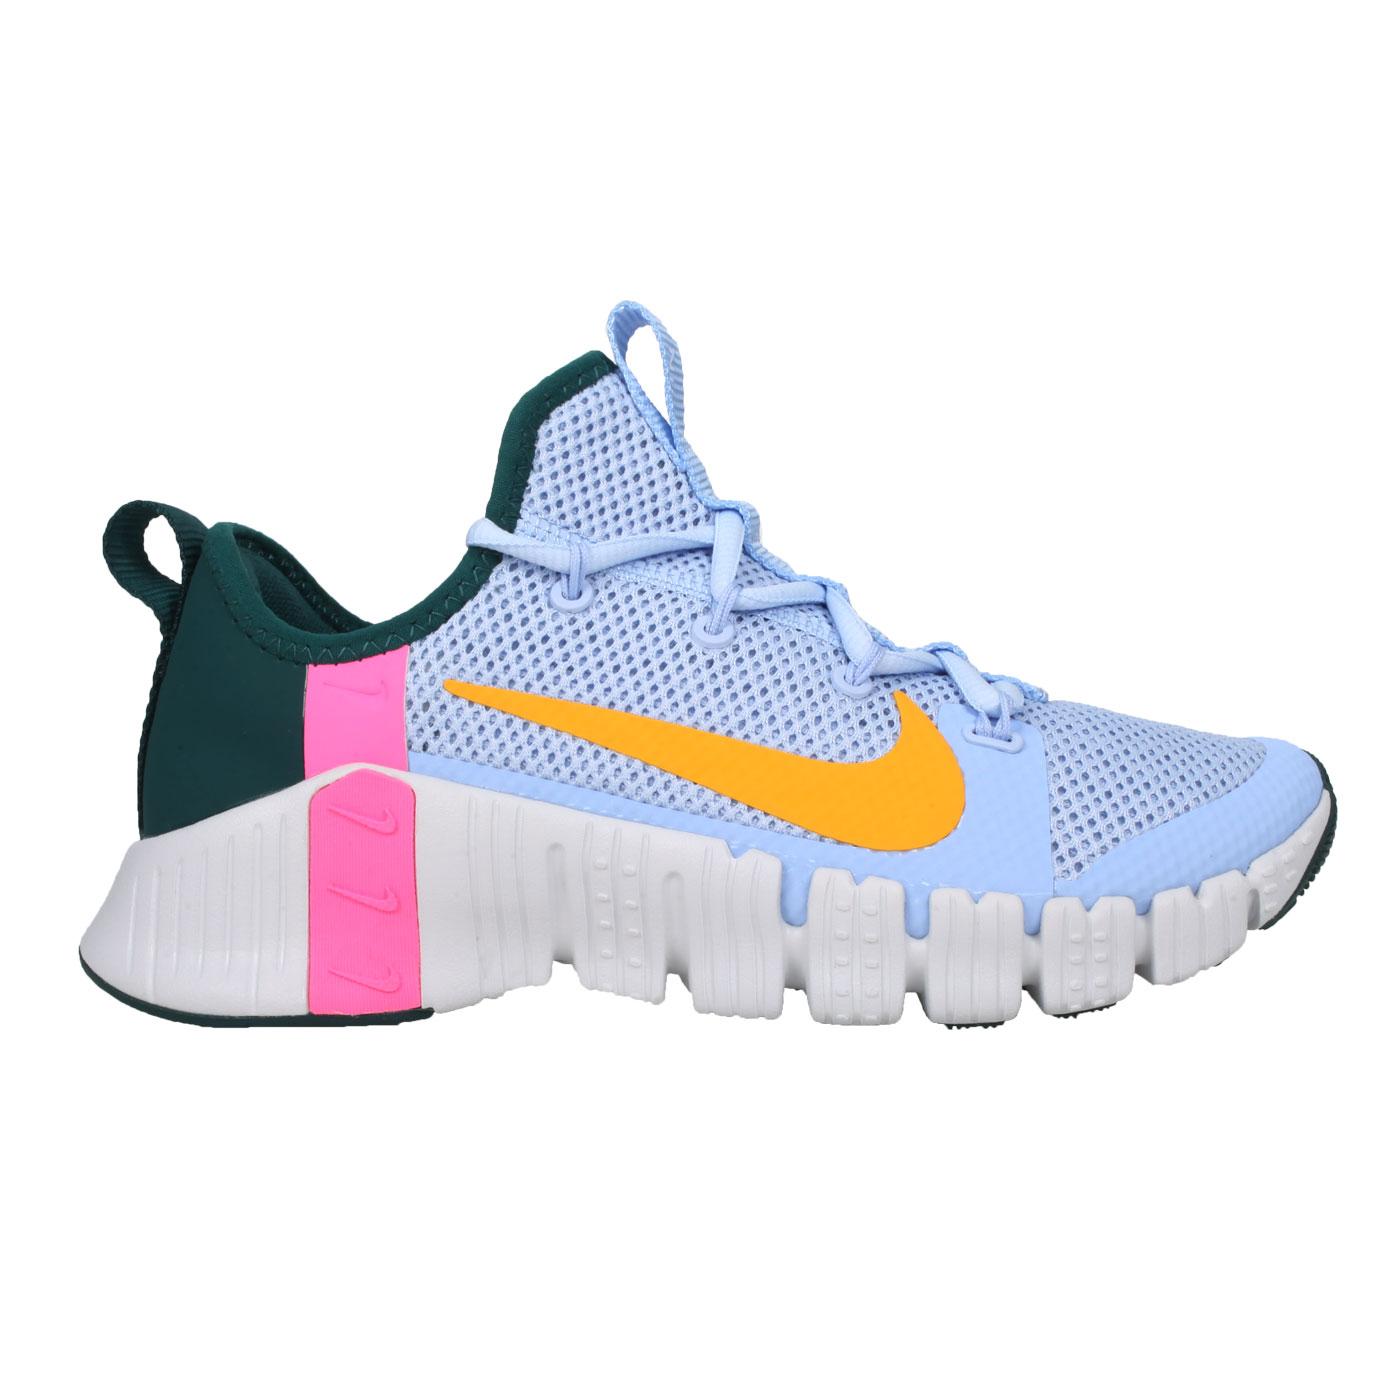 NIKE 女款休閒運動鞋  @WMNS FREE METCON 3@CJ6314564 - 淺藍黃綠粉